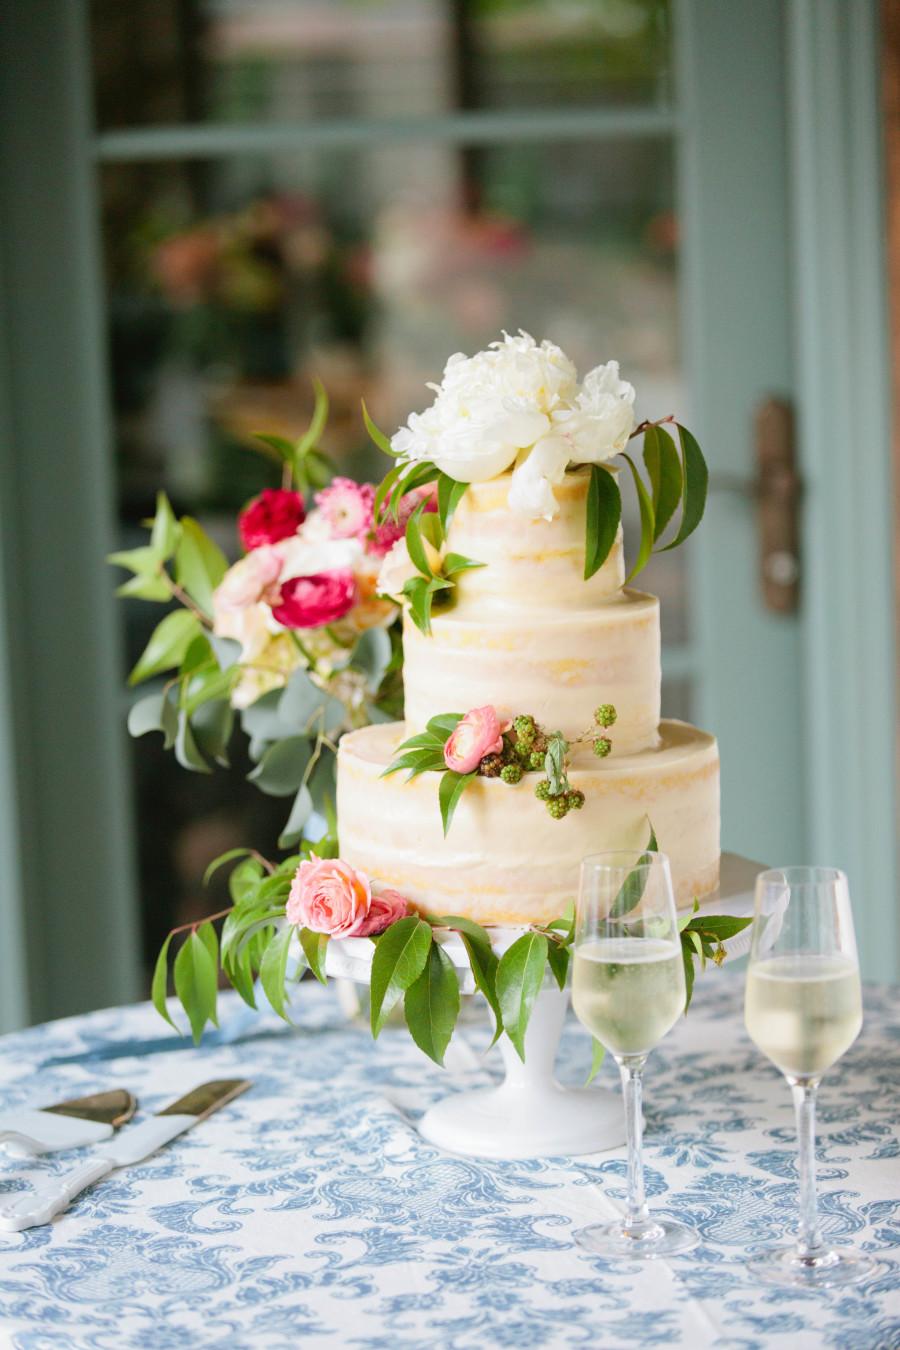 Cake.jpg